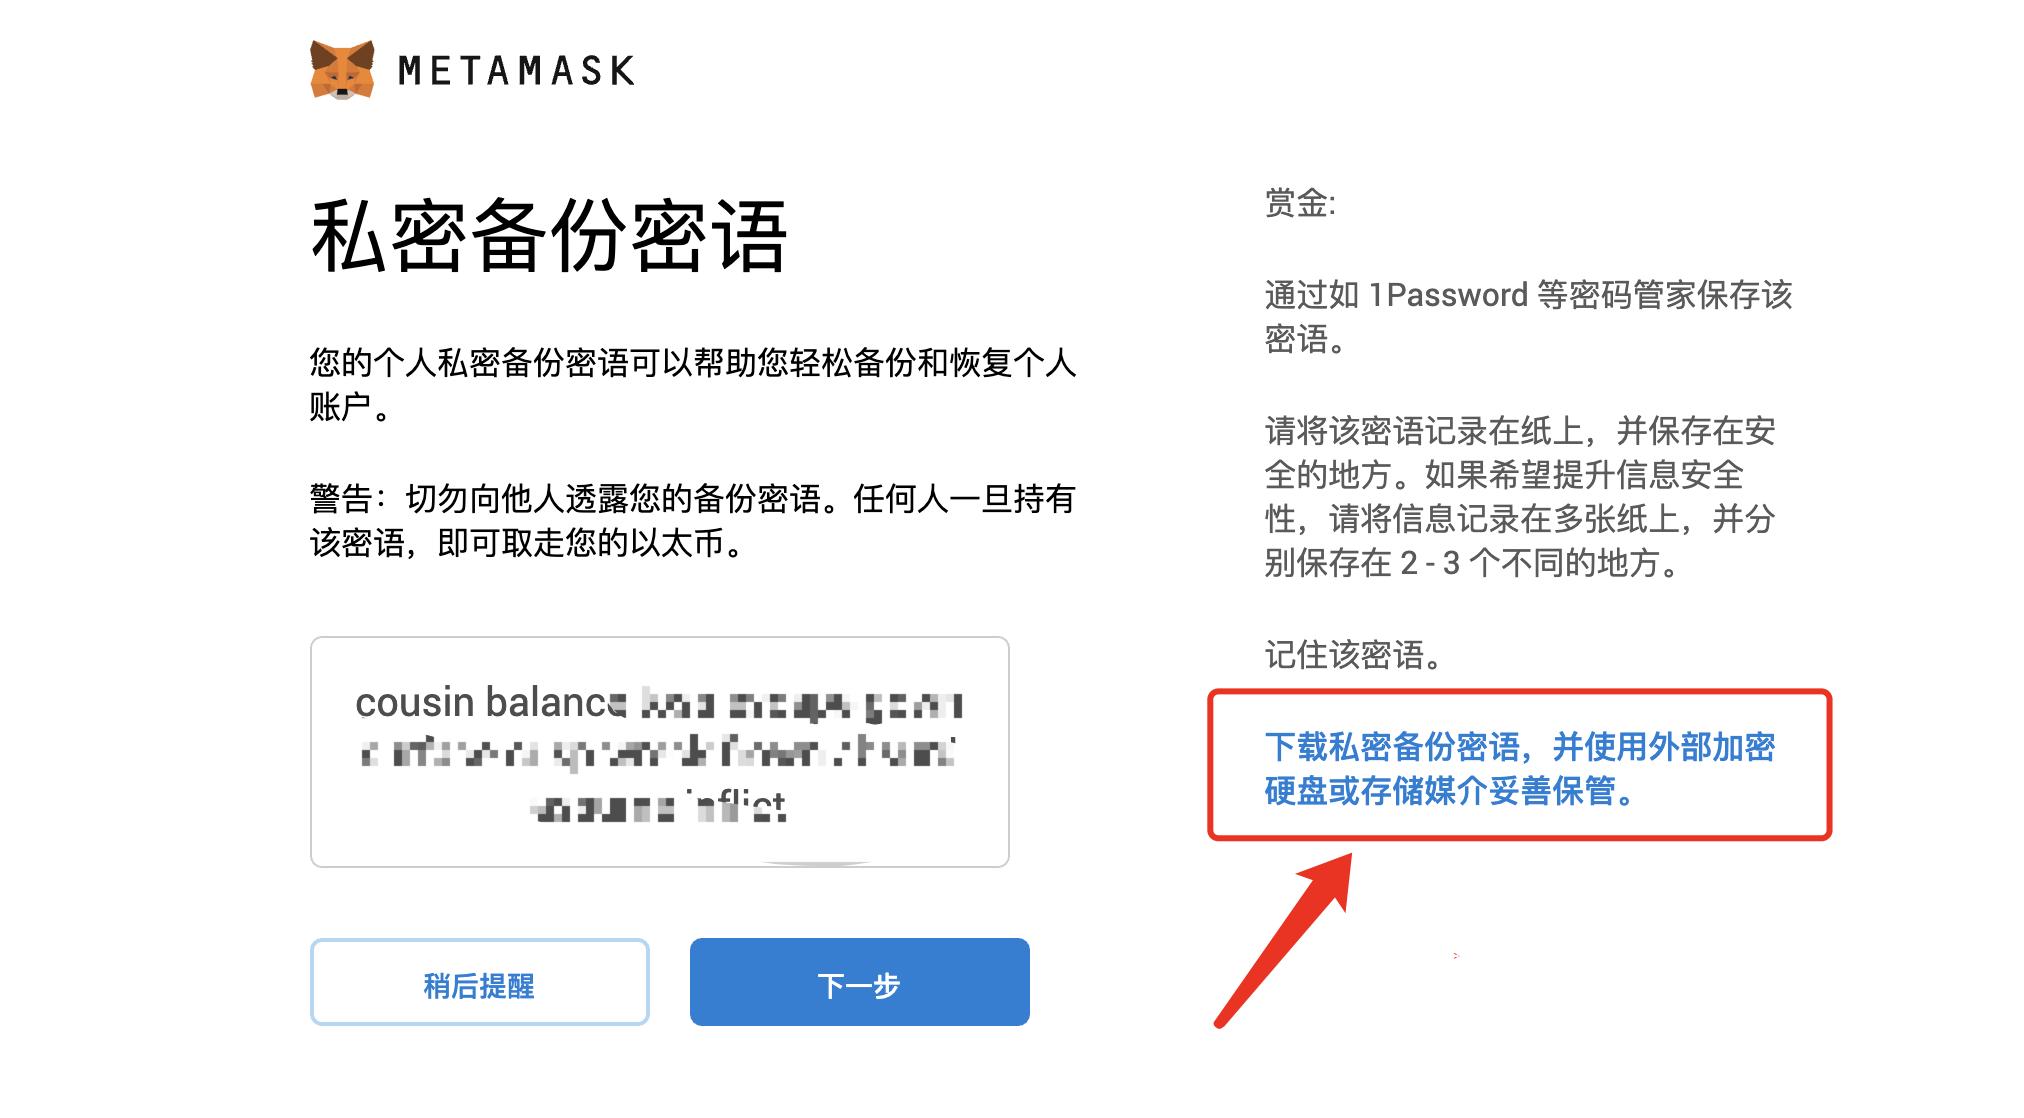 【Solidity合约开发第1篇】3分钟学会使用MetaMask钱包